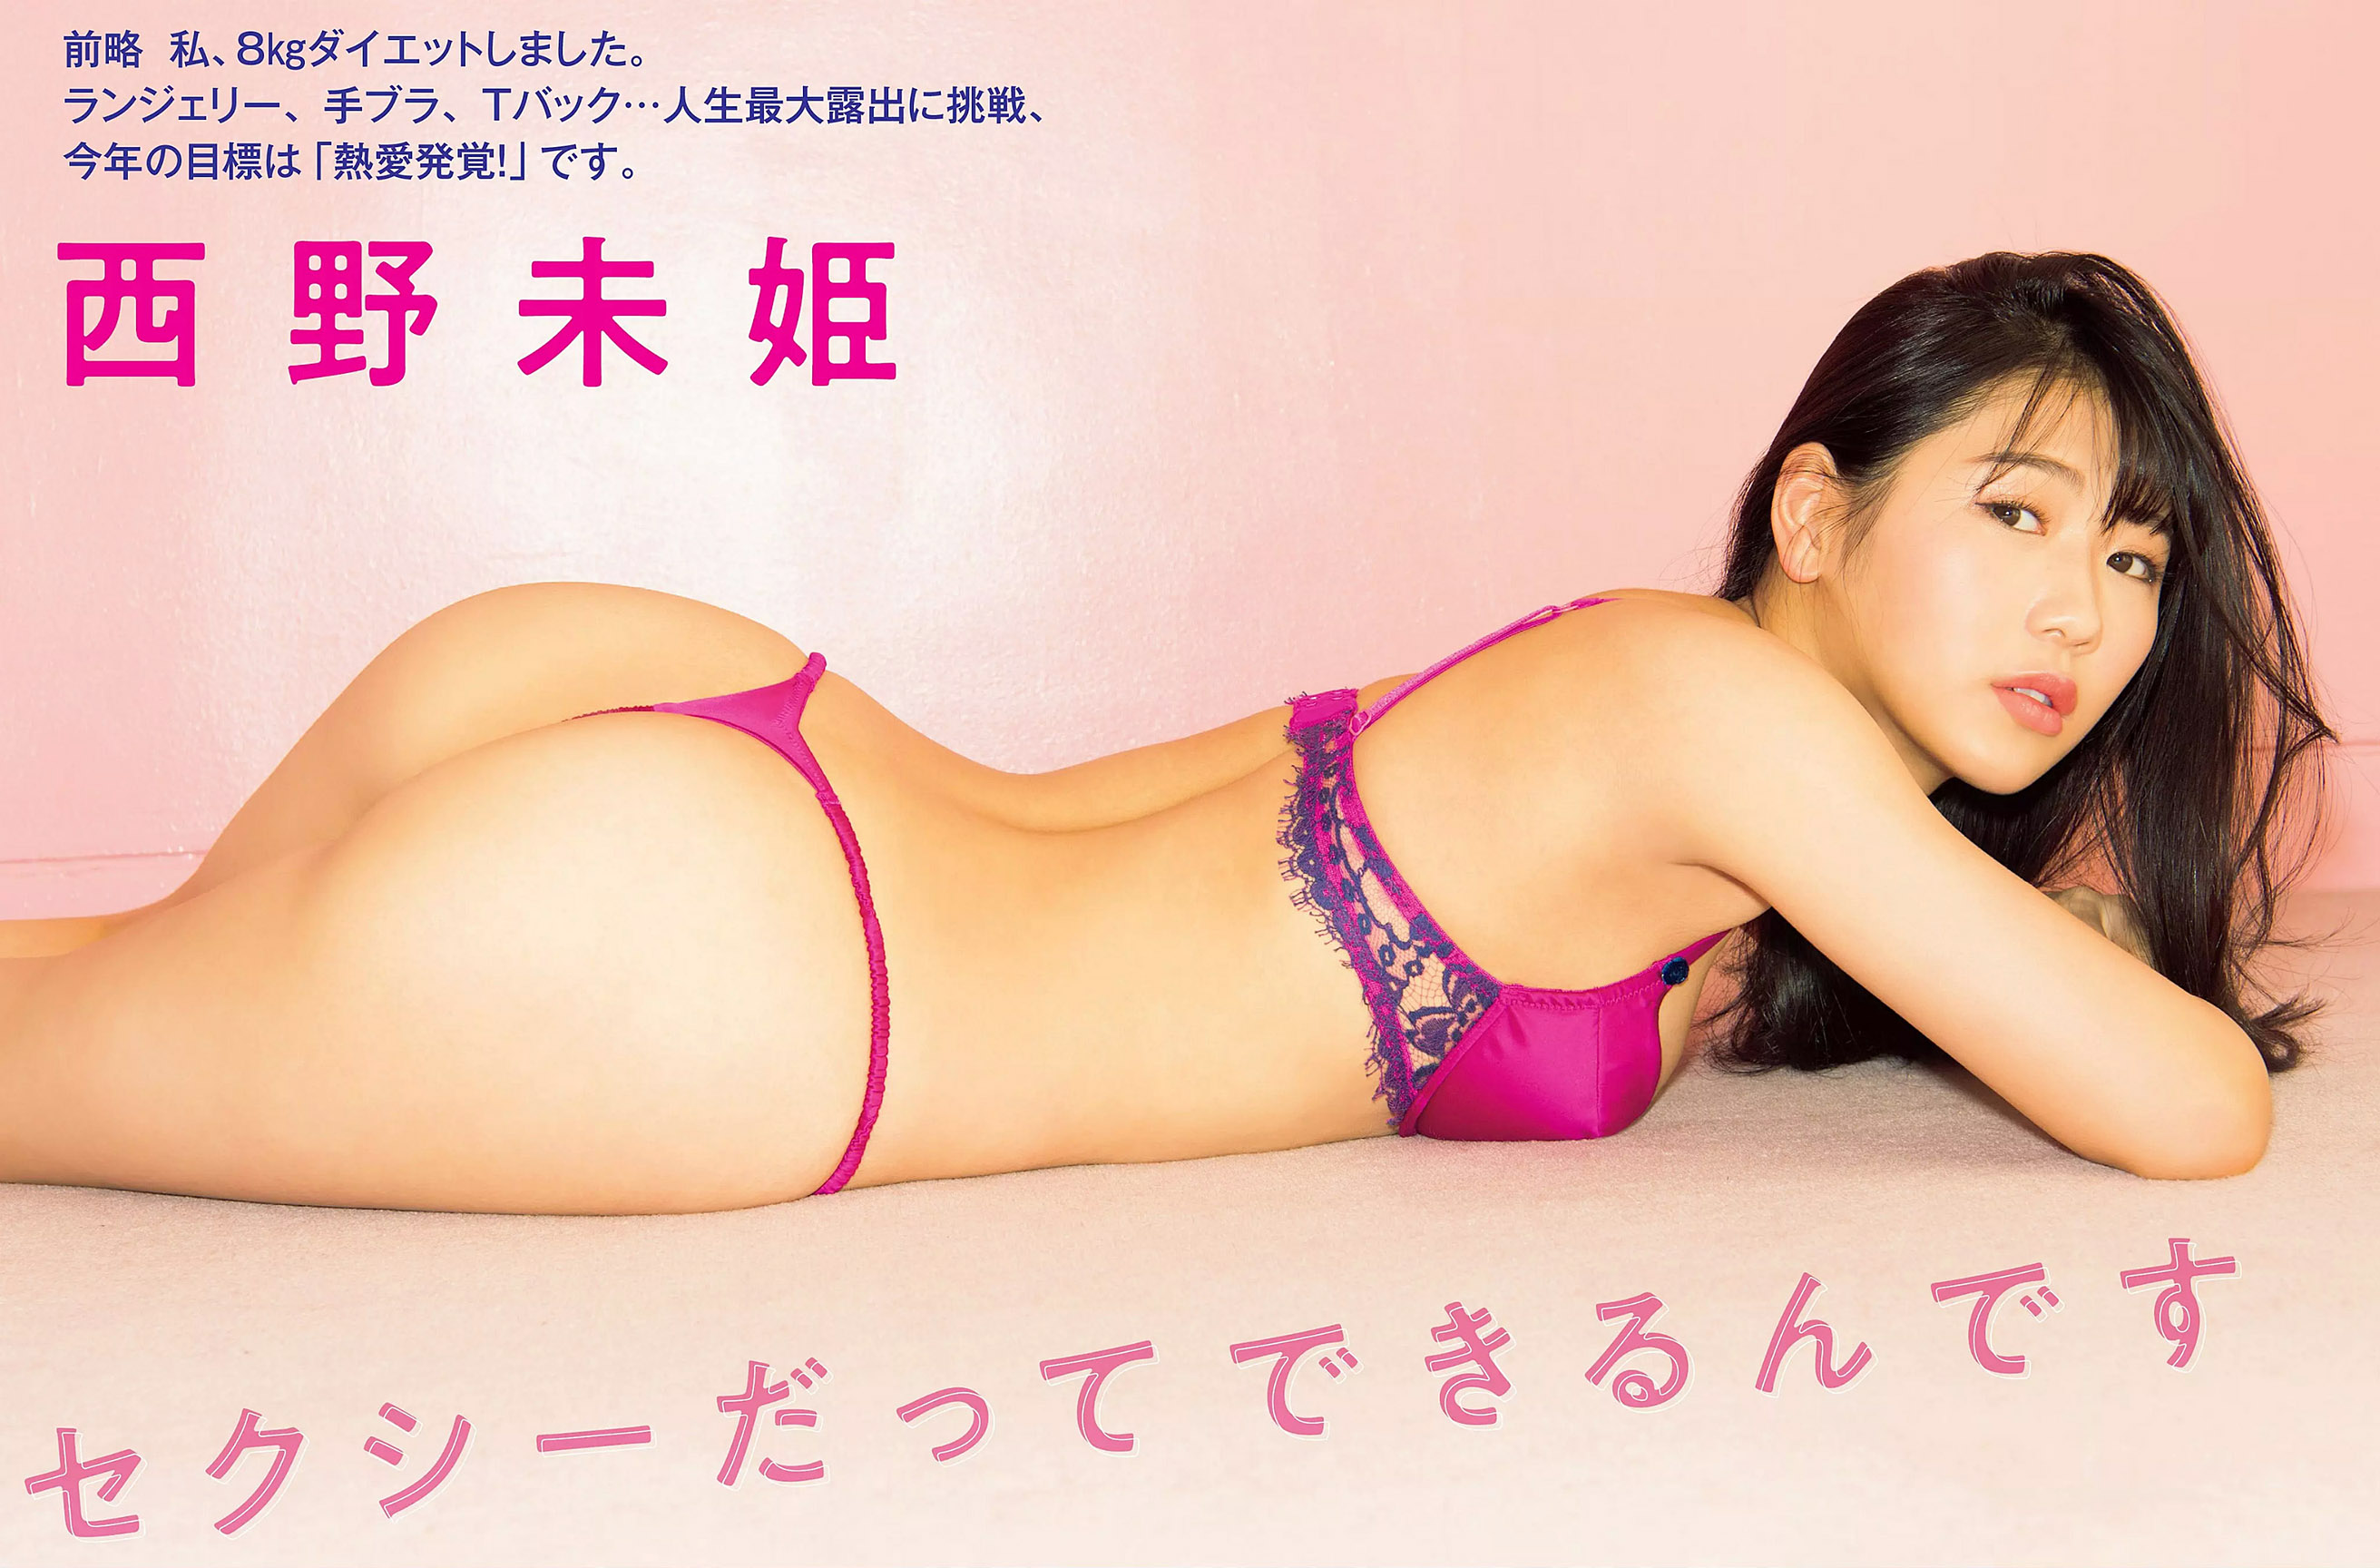 Miki Nishino Flash 200204 01.jpg